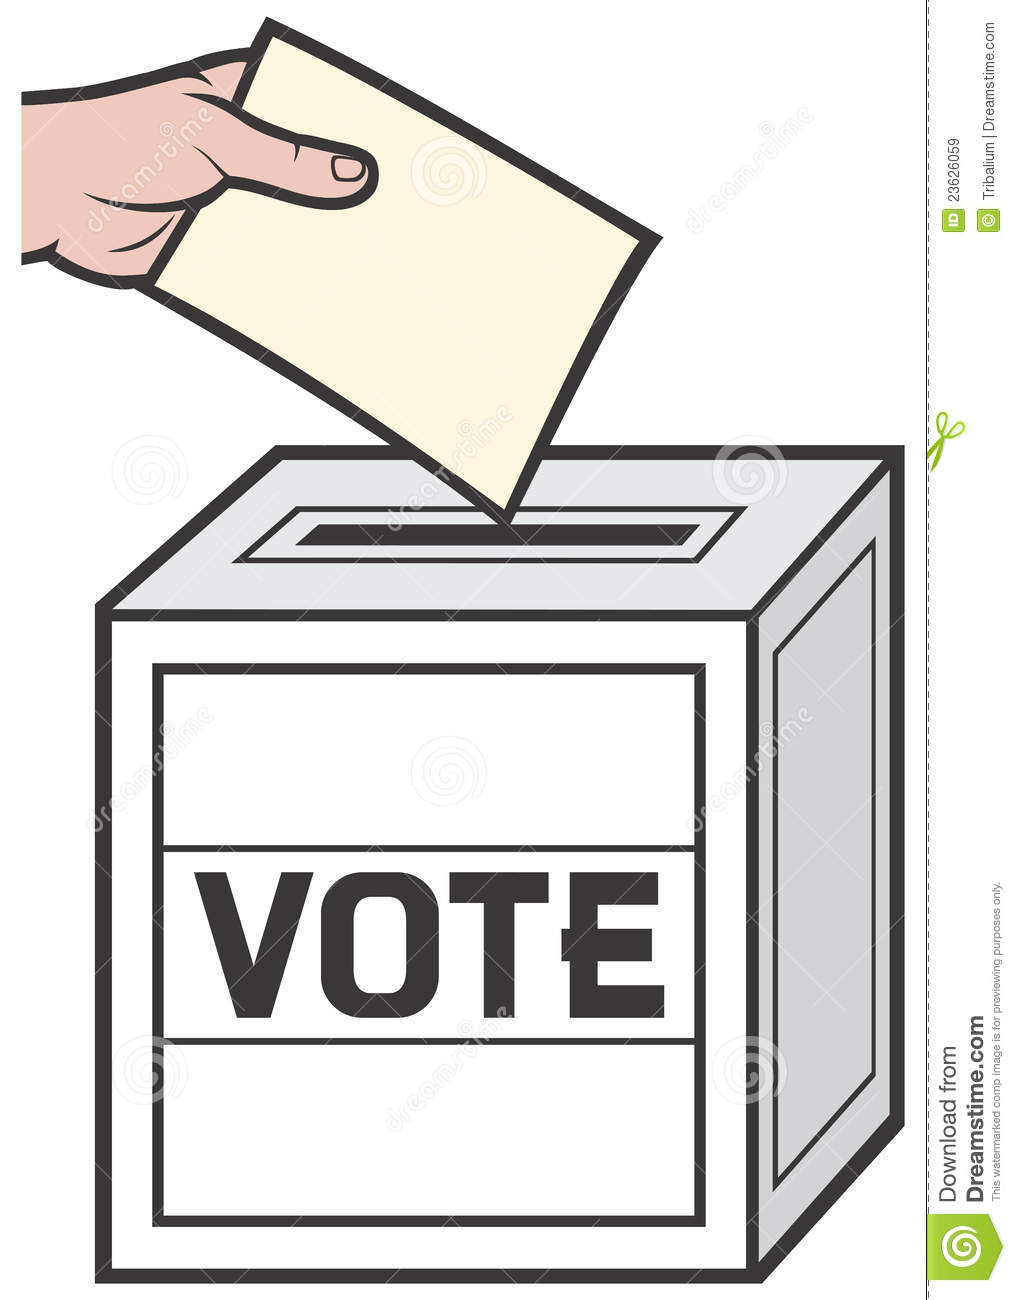 Animated vote clipart.